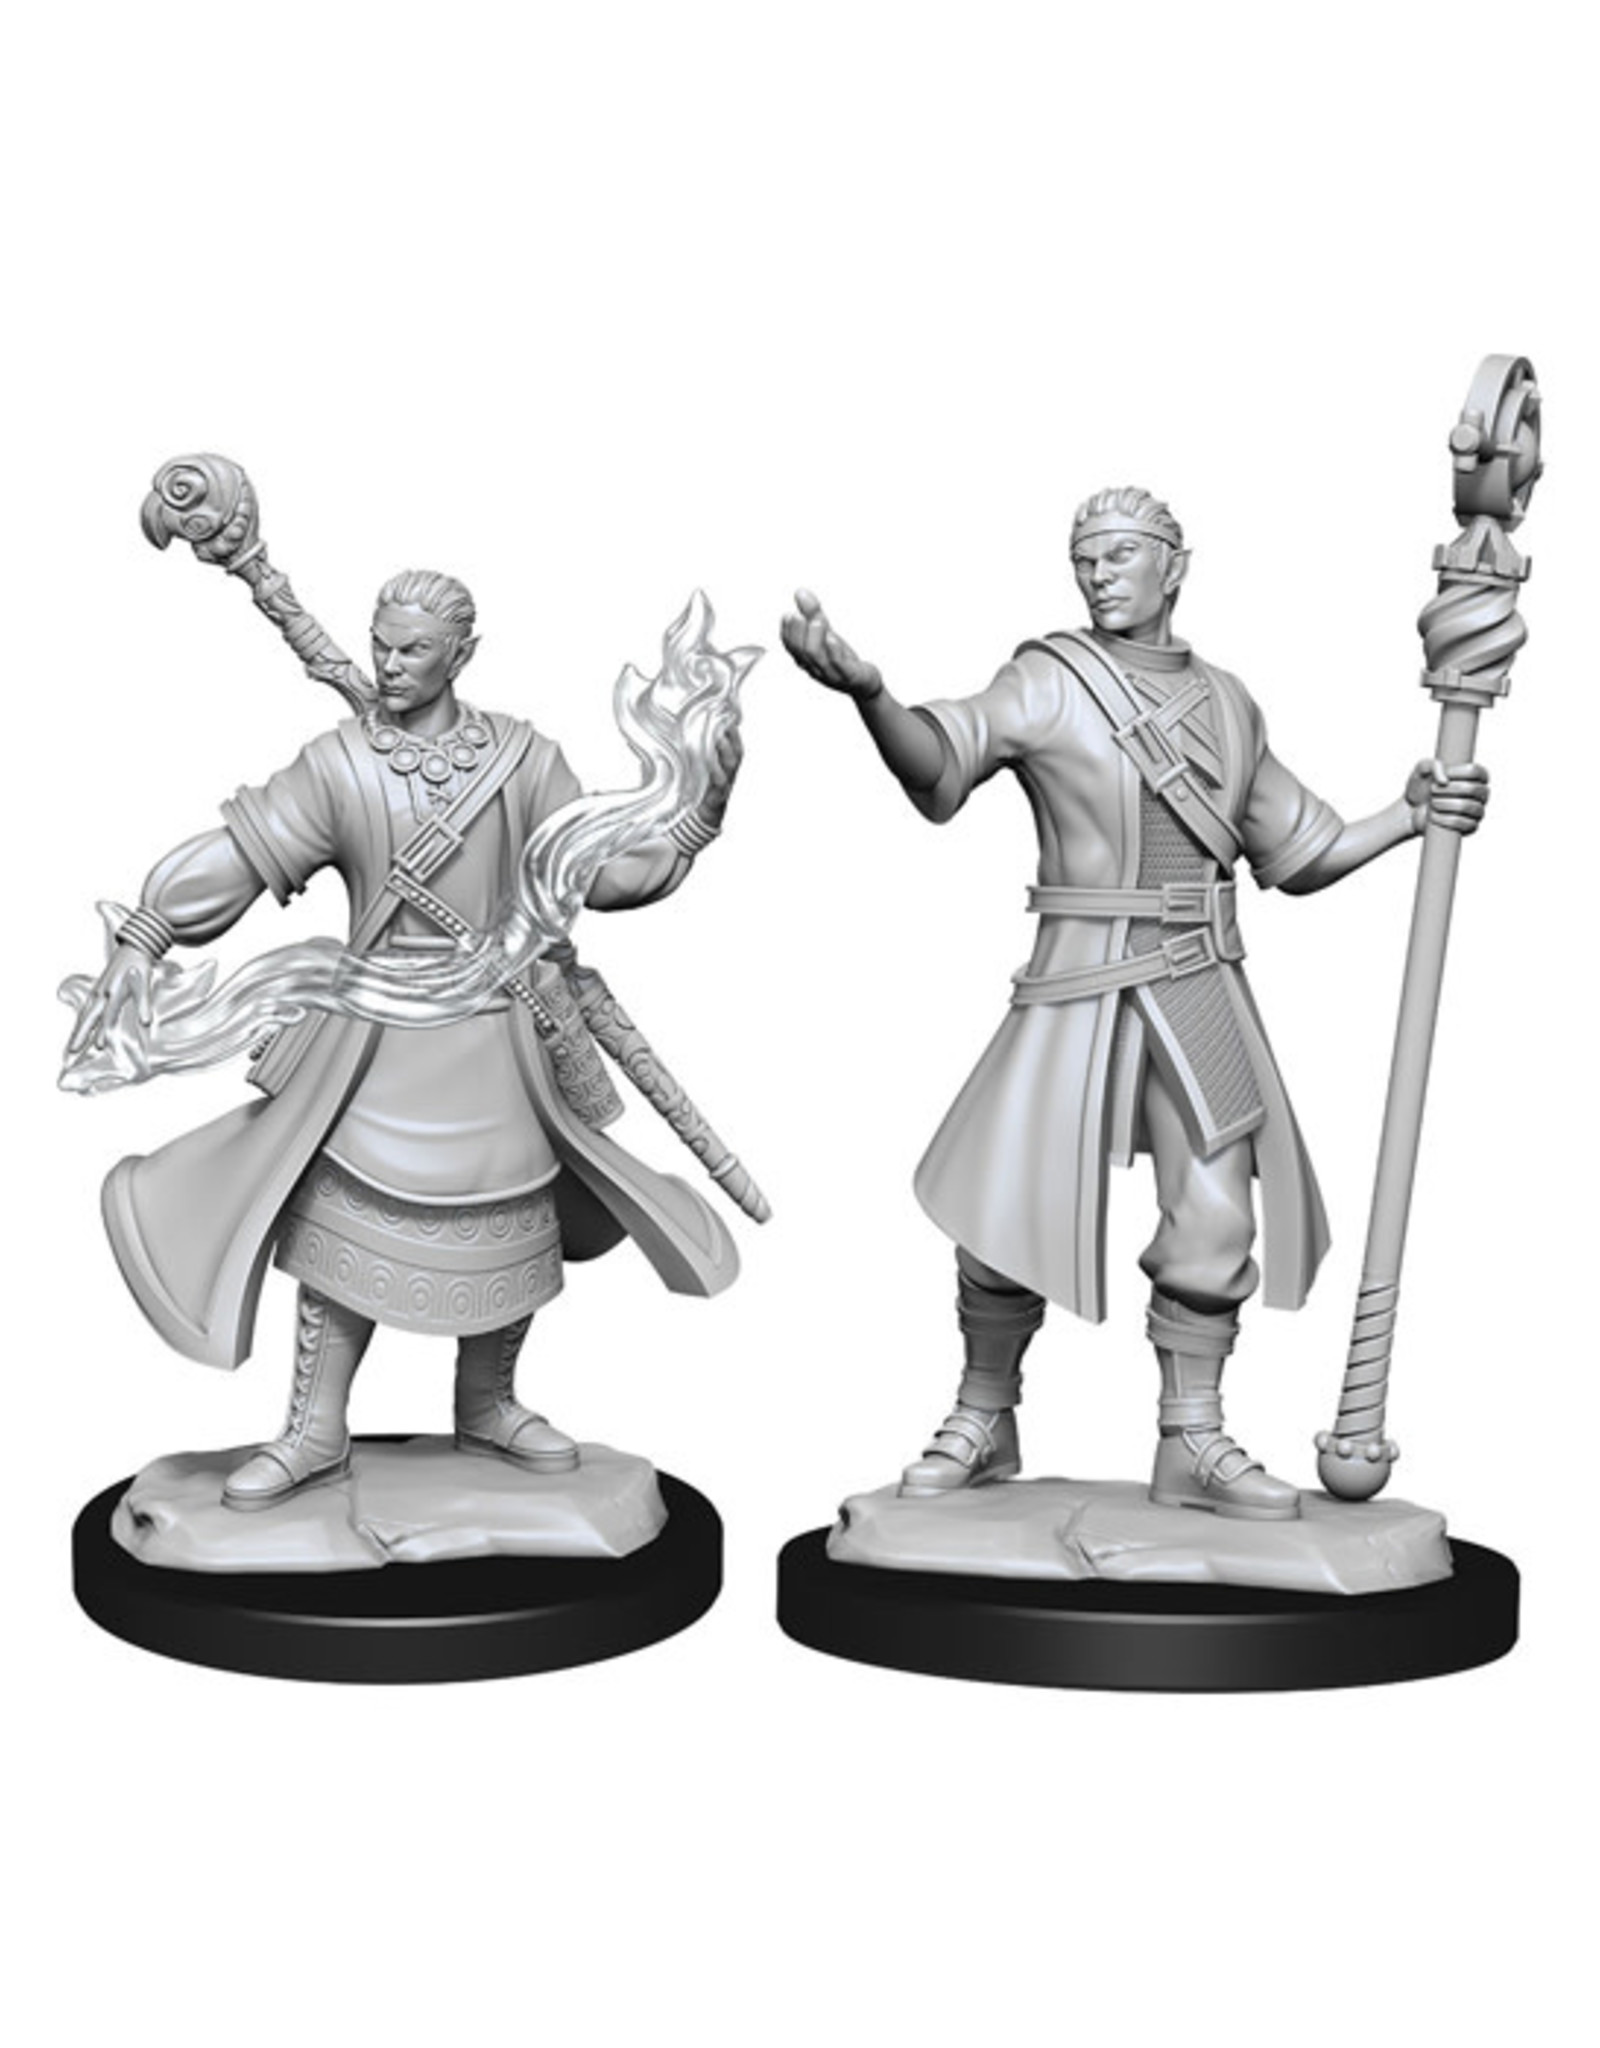 Dungeons & Dragons Dungeons & Dragons: Nolzur's - Half-Elf Male Wizard